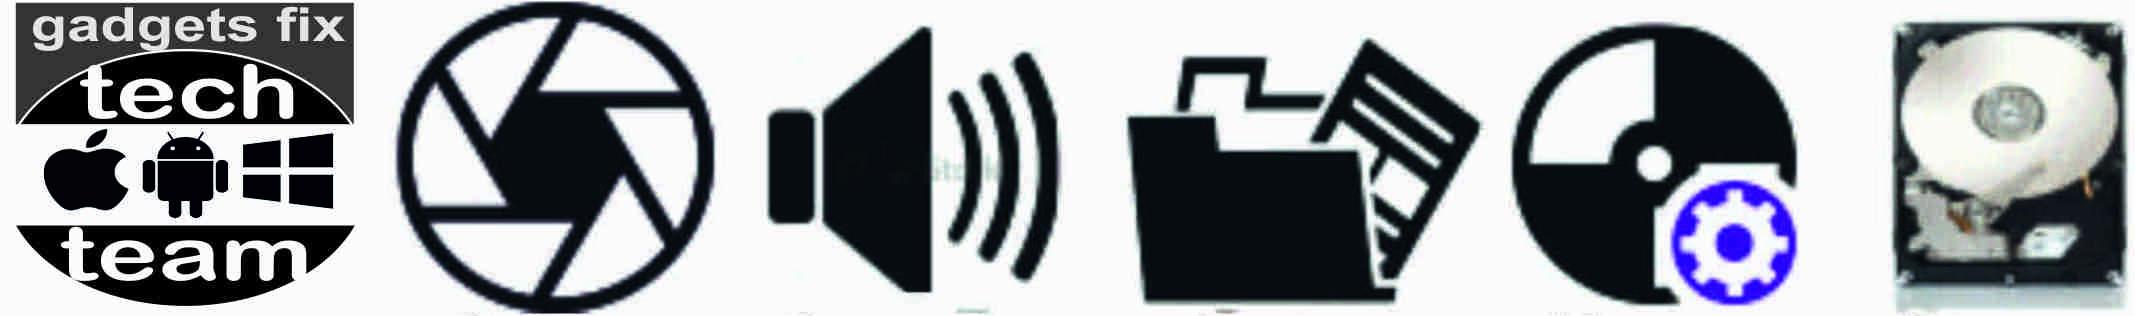 Gadgets fix camera sound data software har drives storage